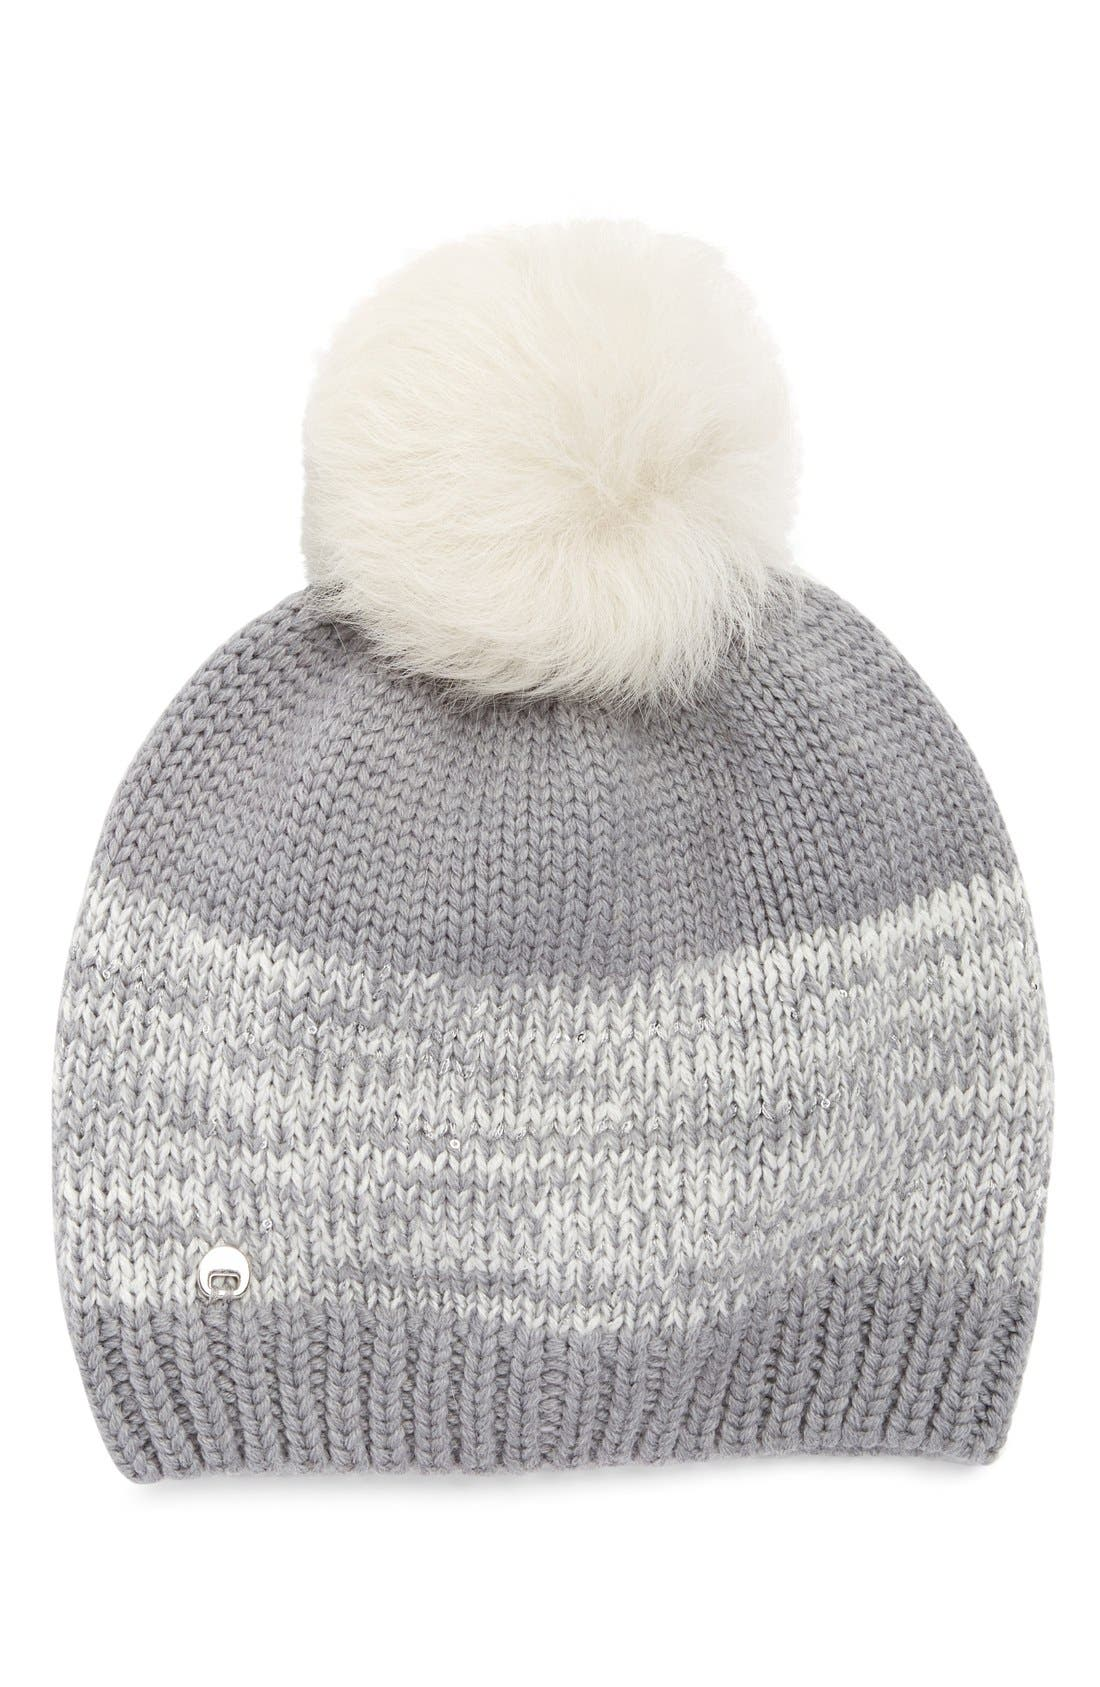 Main Image - UGG® Australia Genuine Shearling Pom Marled Knit Beanie